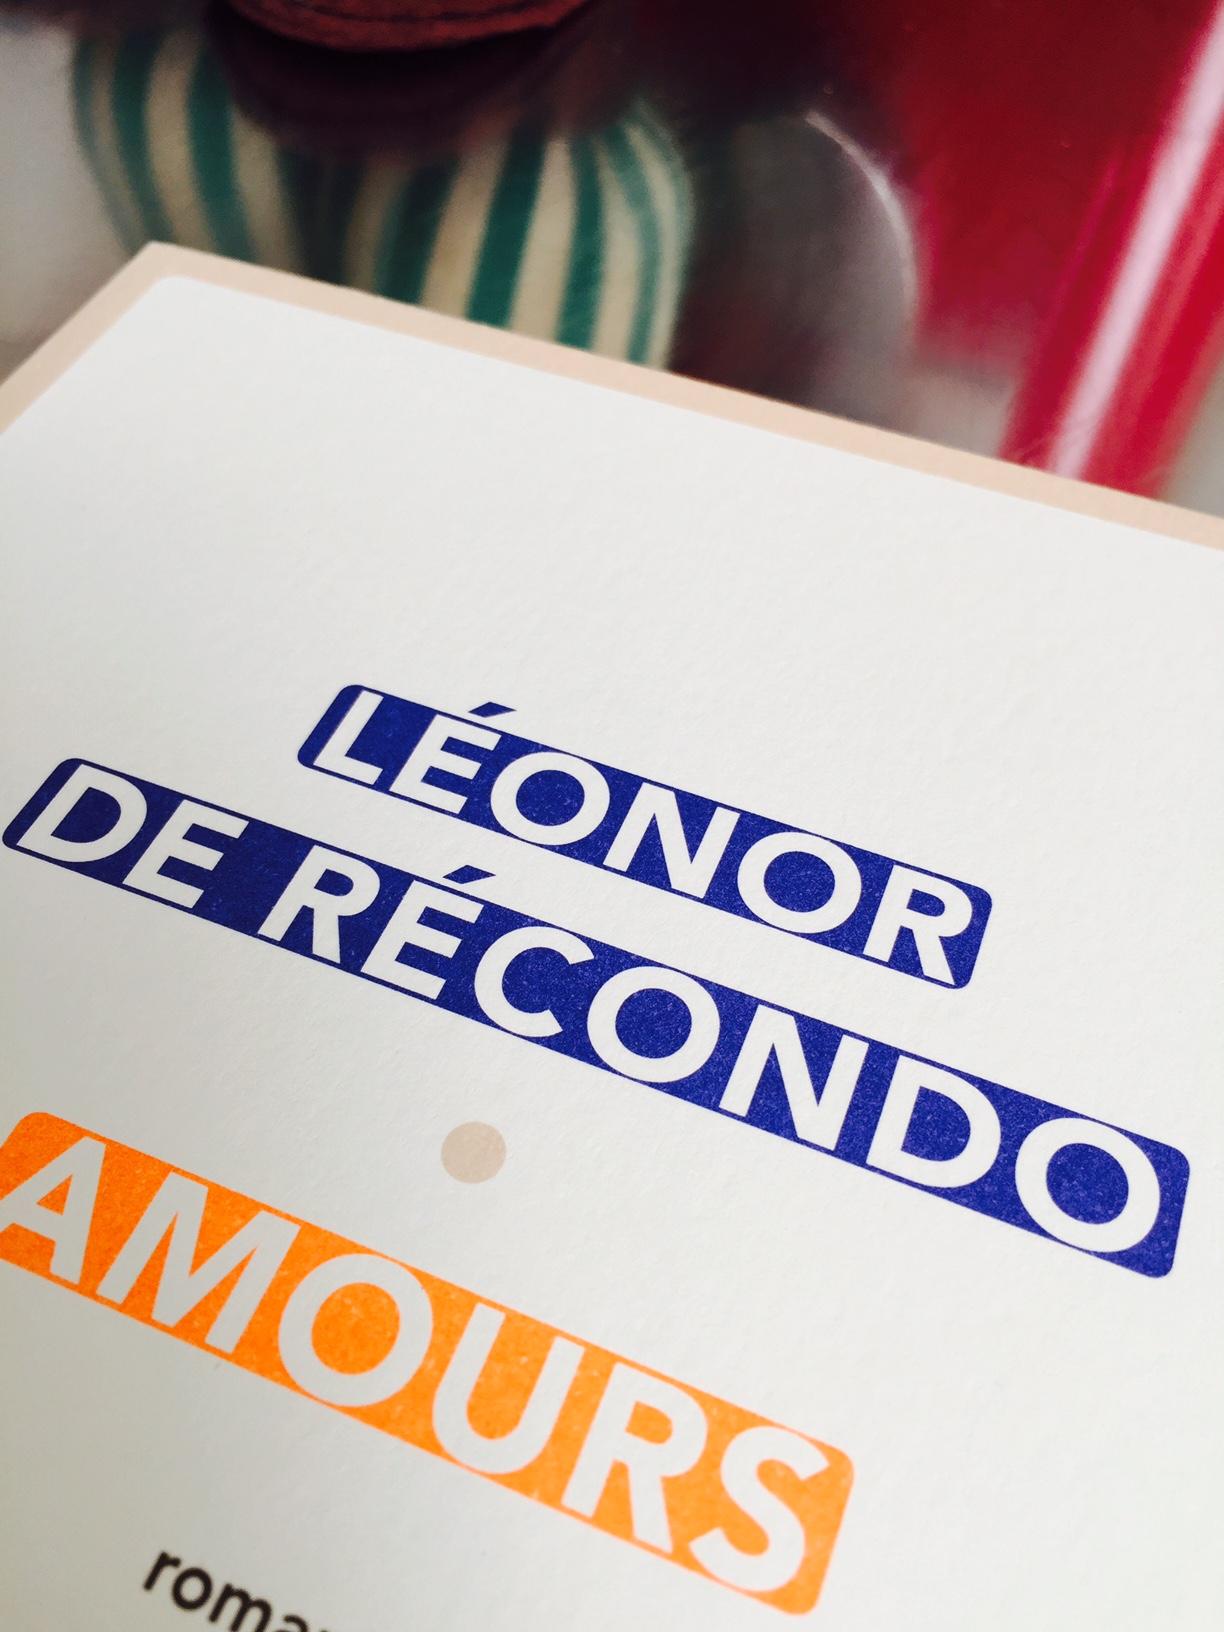 Leonor_de_Recondo